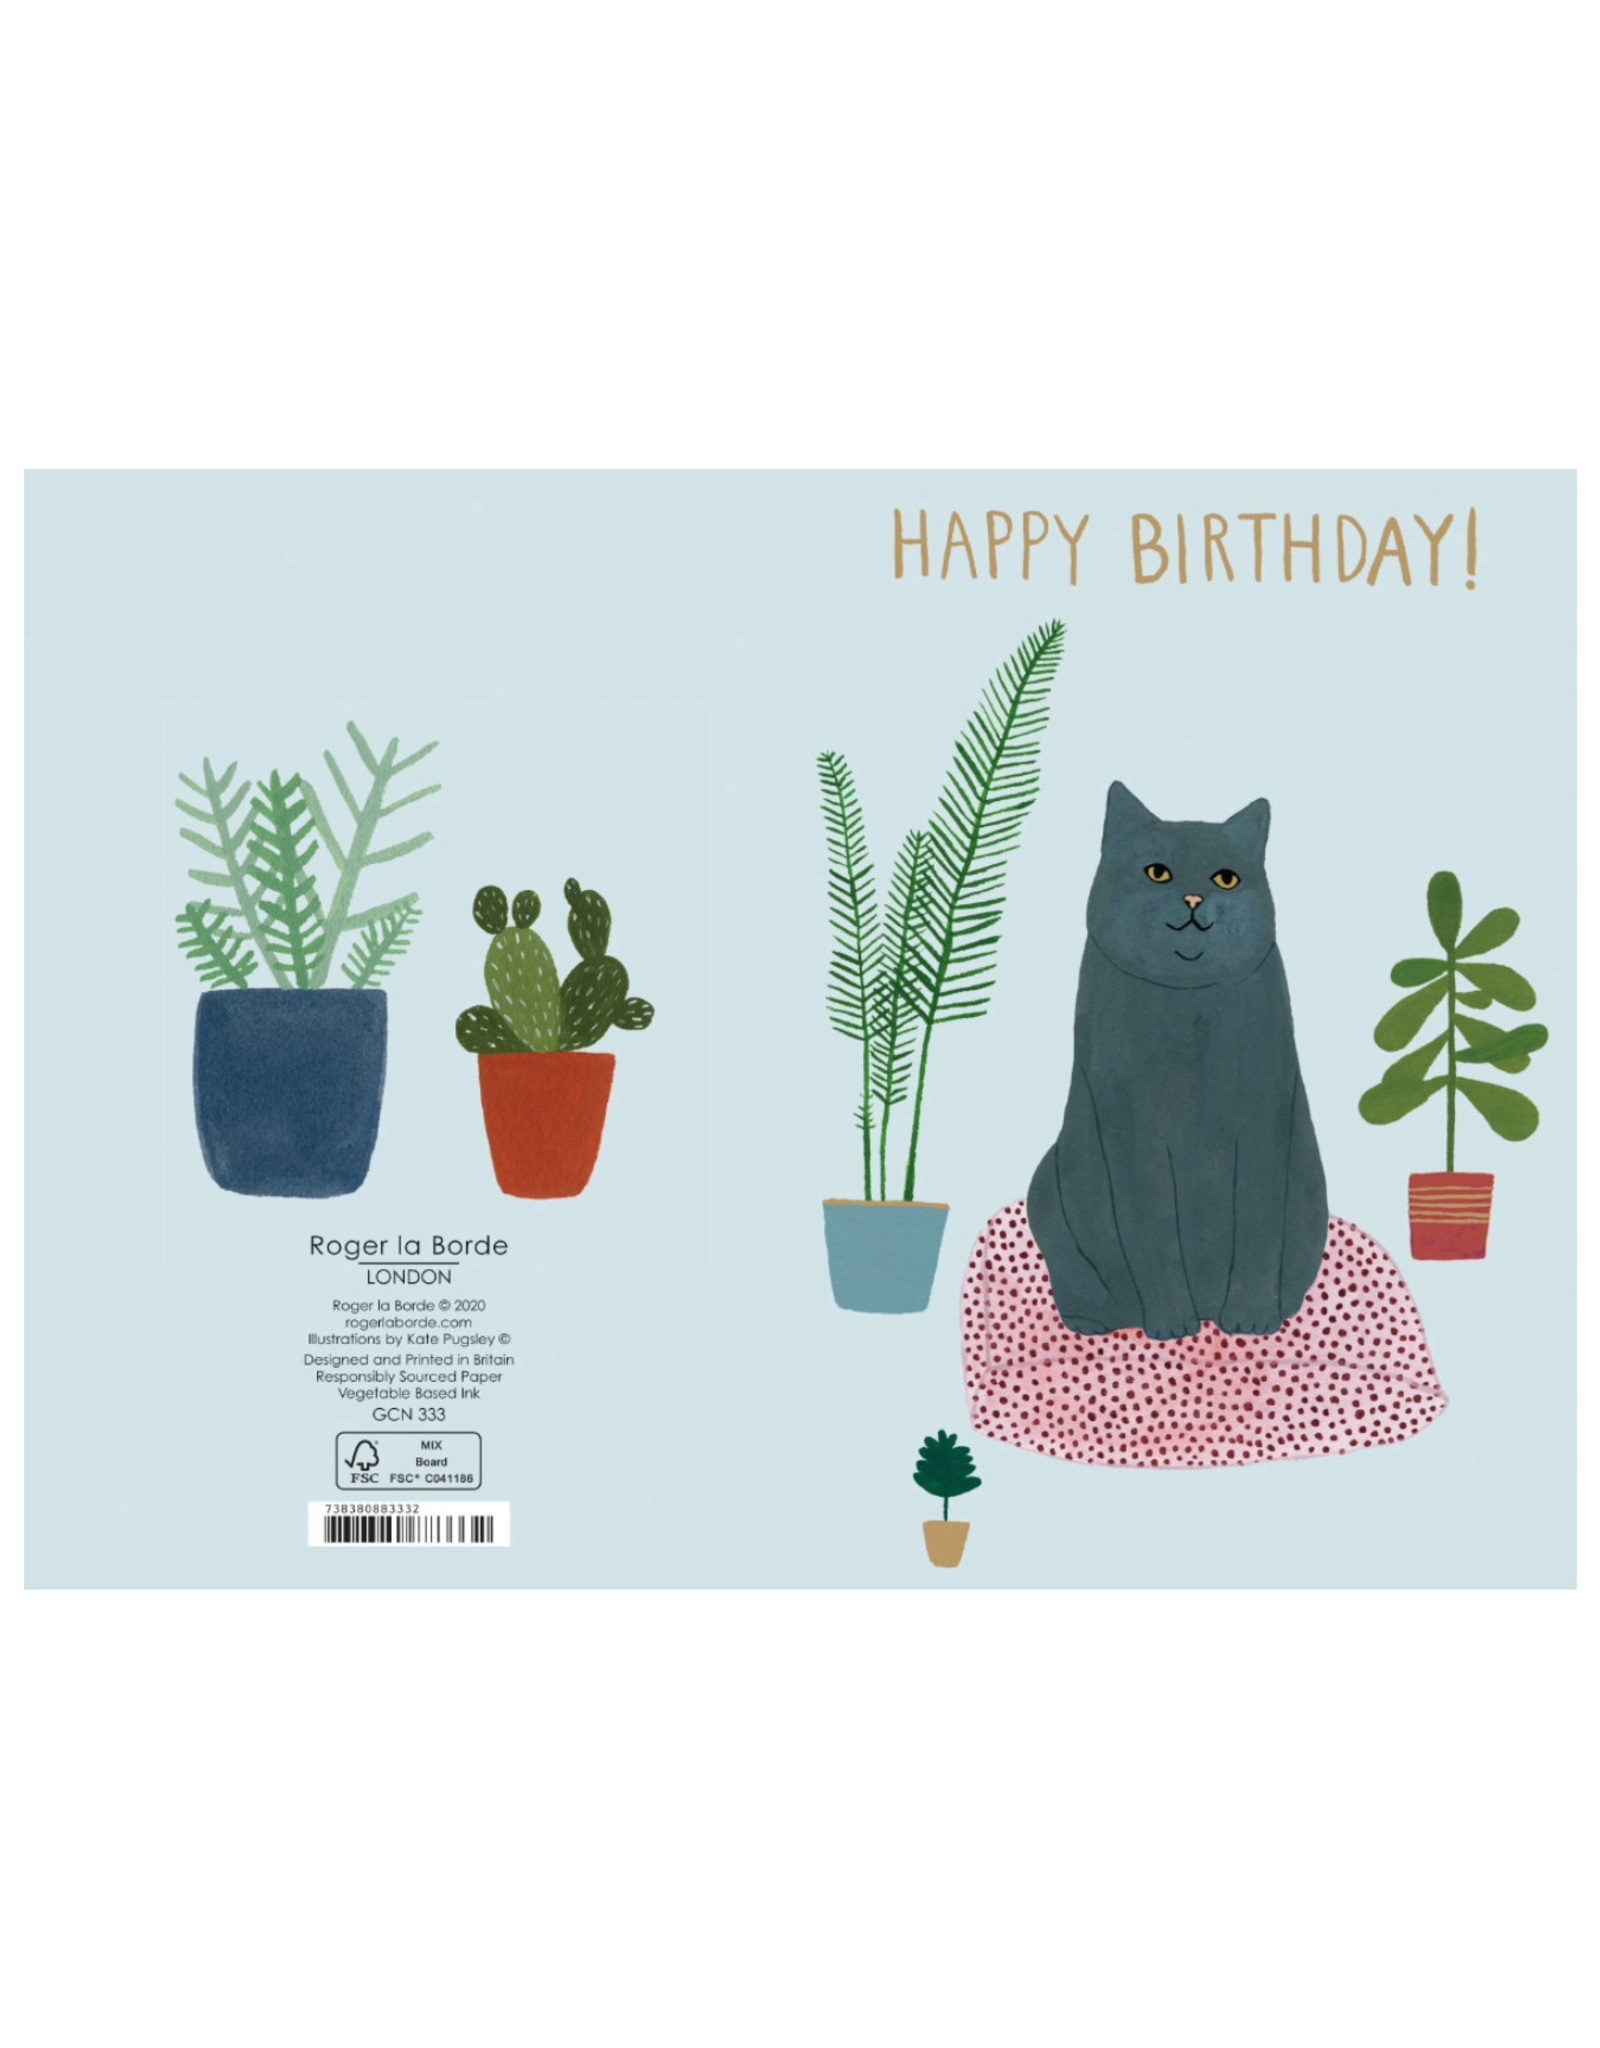 Roger La Borde Cat Bed Happy Birthday Greeting Card